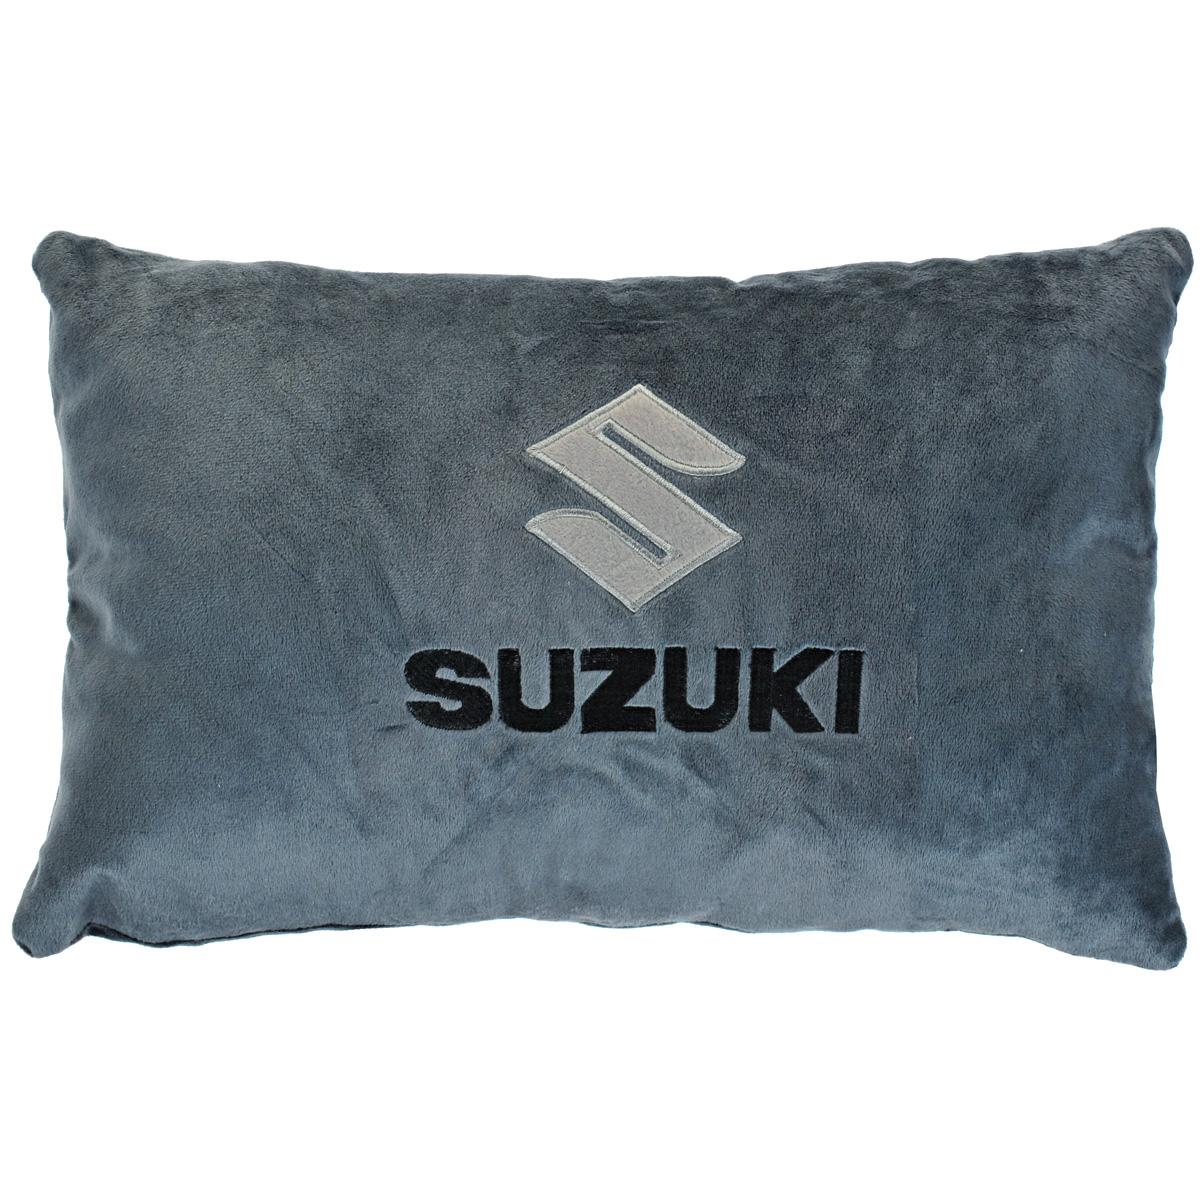 Подушка автомобильная Suzuki, цвет: серый, 41 см х 25 см х 14 смPS-SUT121145G